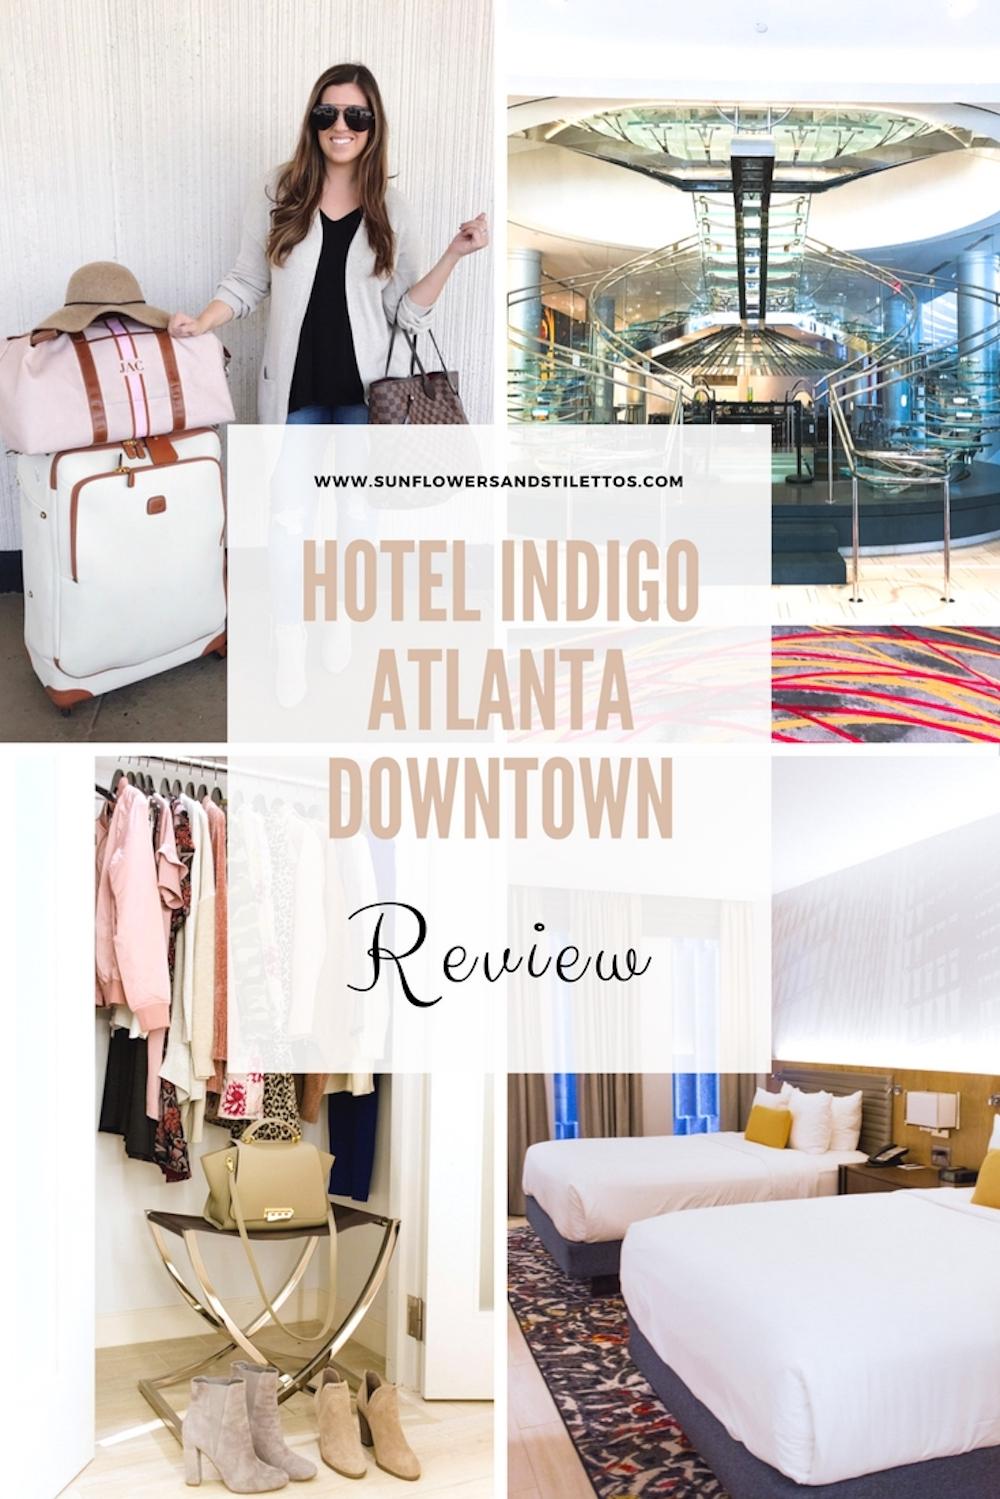 HOTEL INDIGO ATLANTA DOWNTOWN REVIEW, Sunflowers and Stilettos blog, travel blog